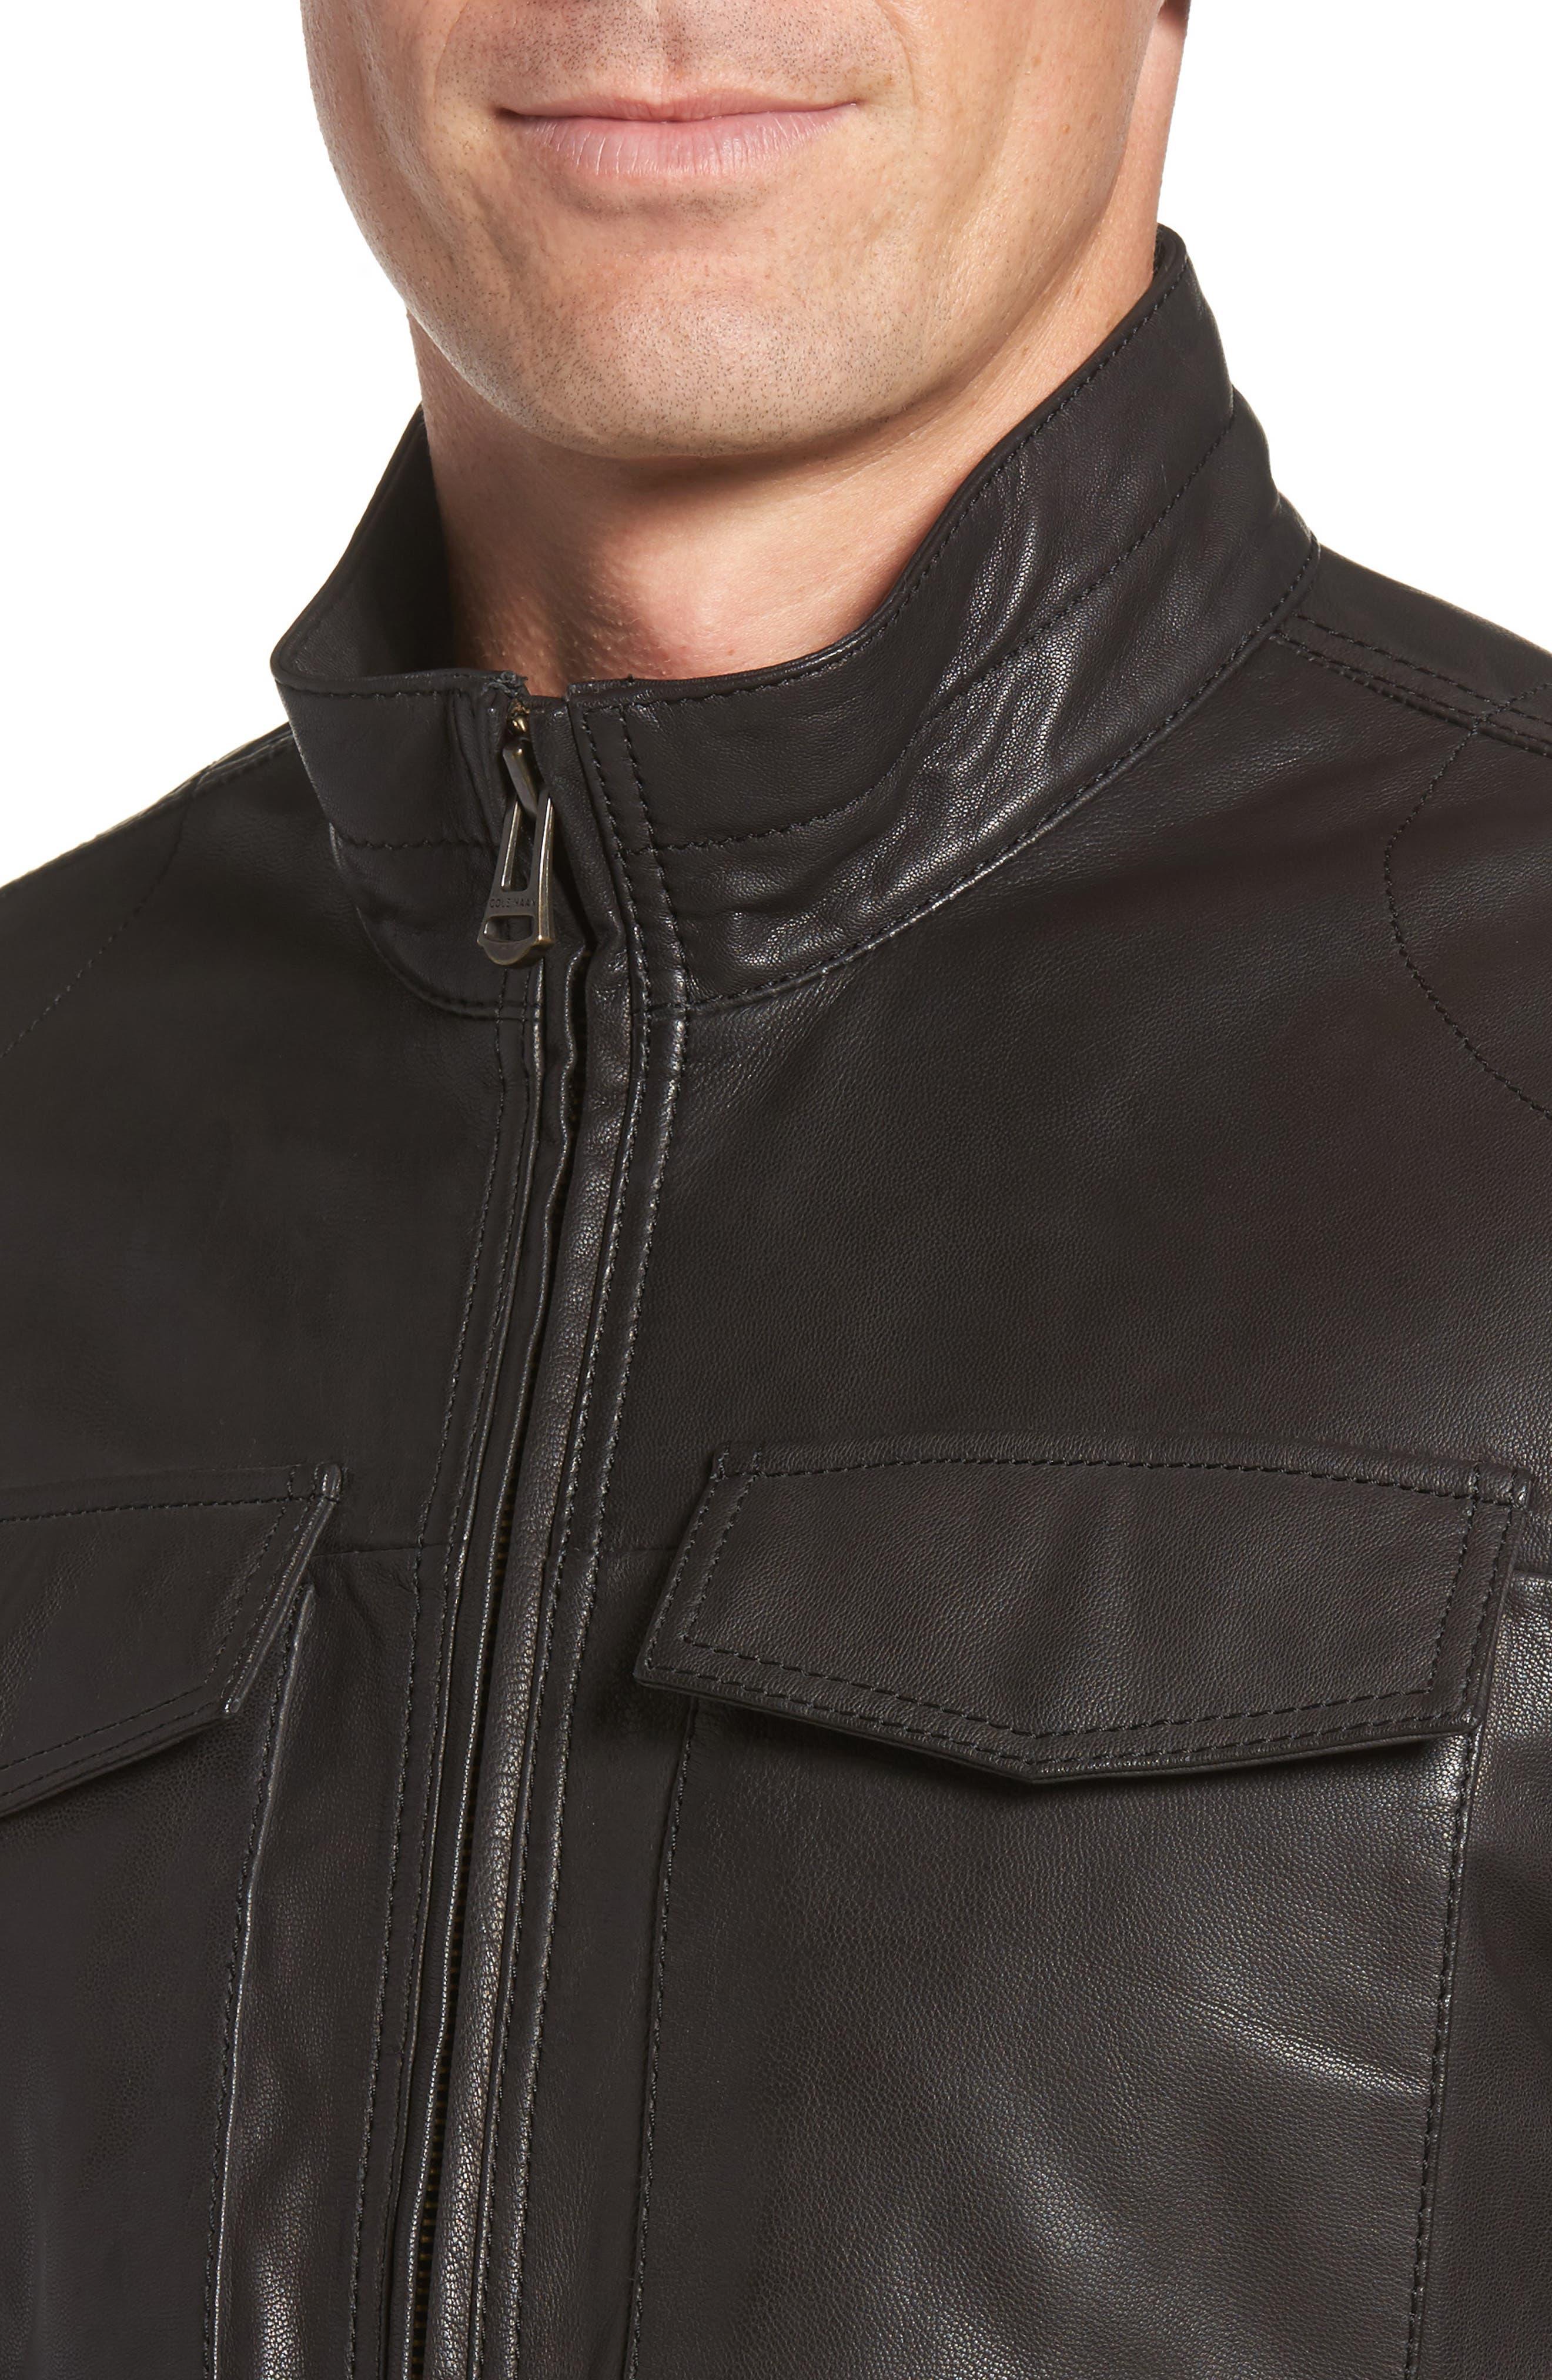 Washed Leather Trucker Jacket,                             Alternate thumbnail 4, color,                             BLACK